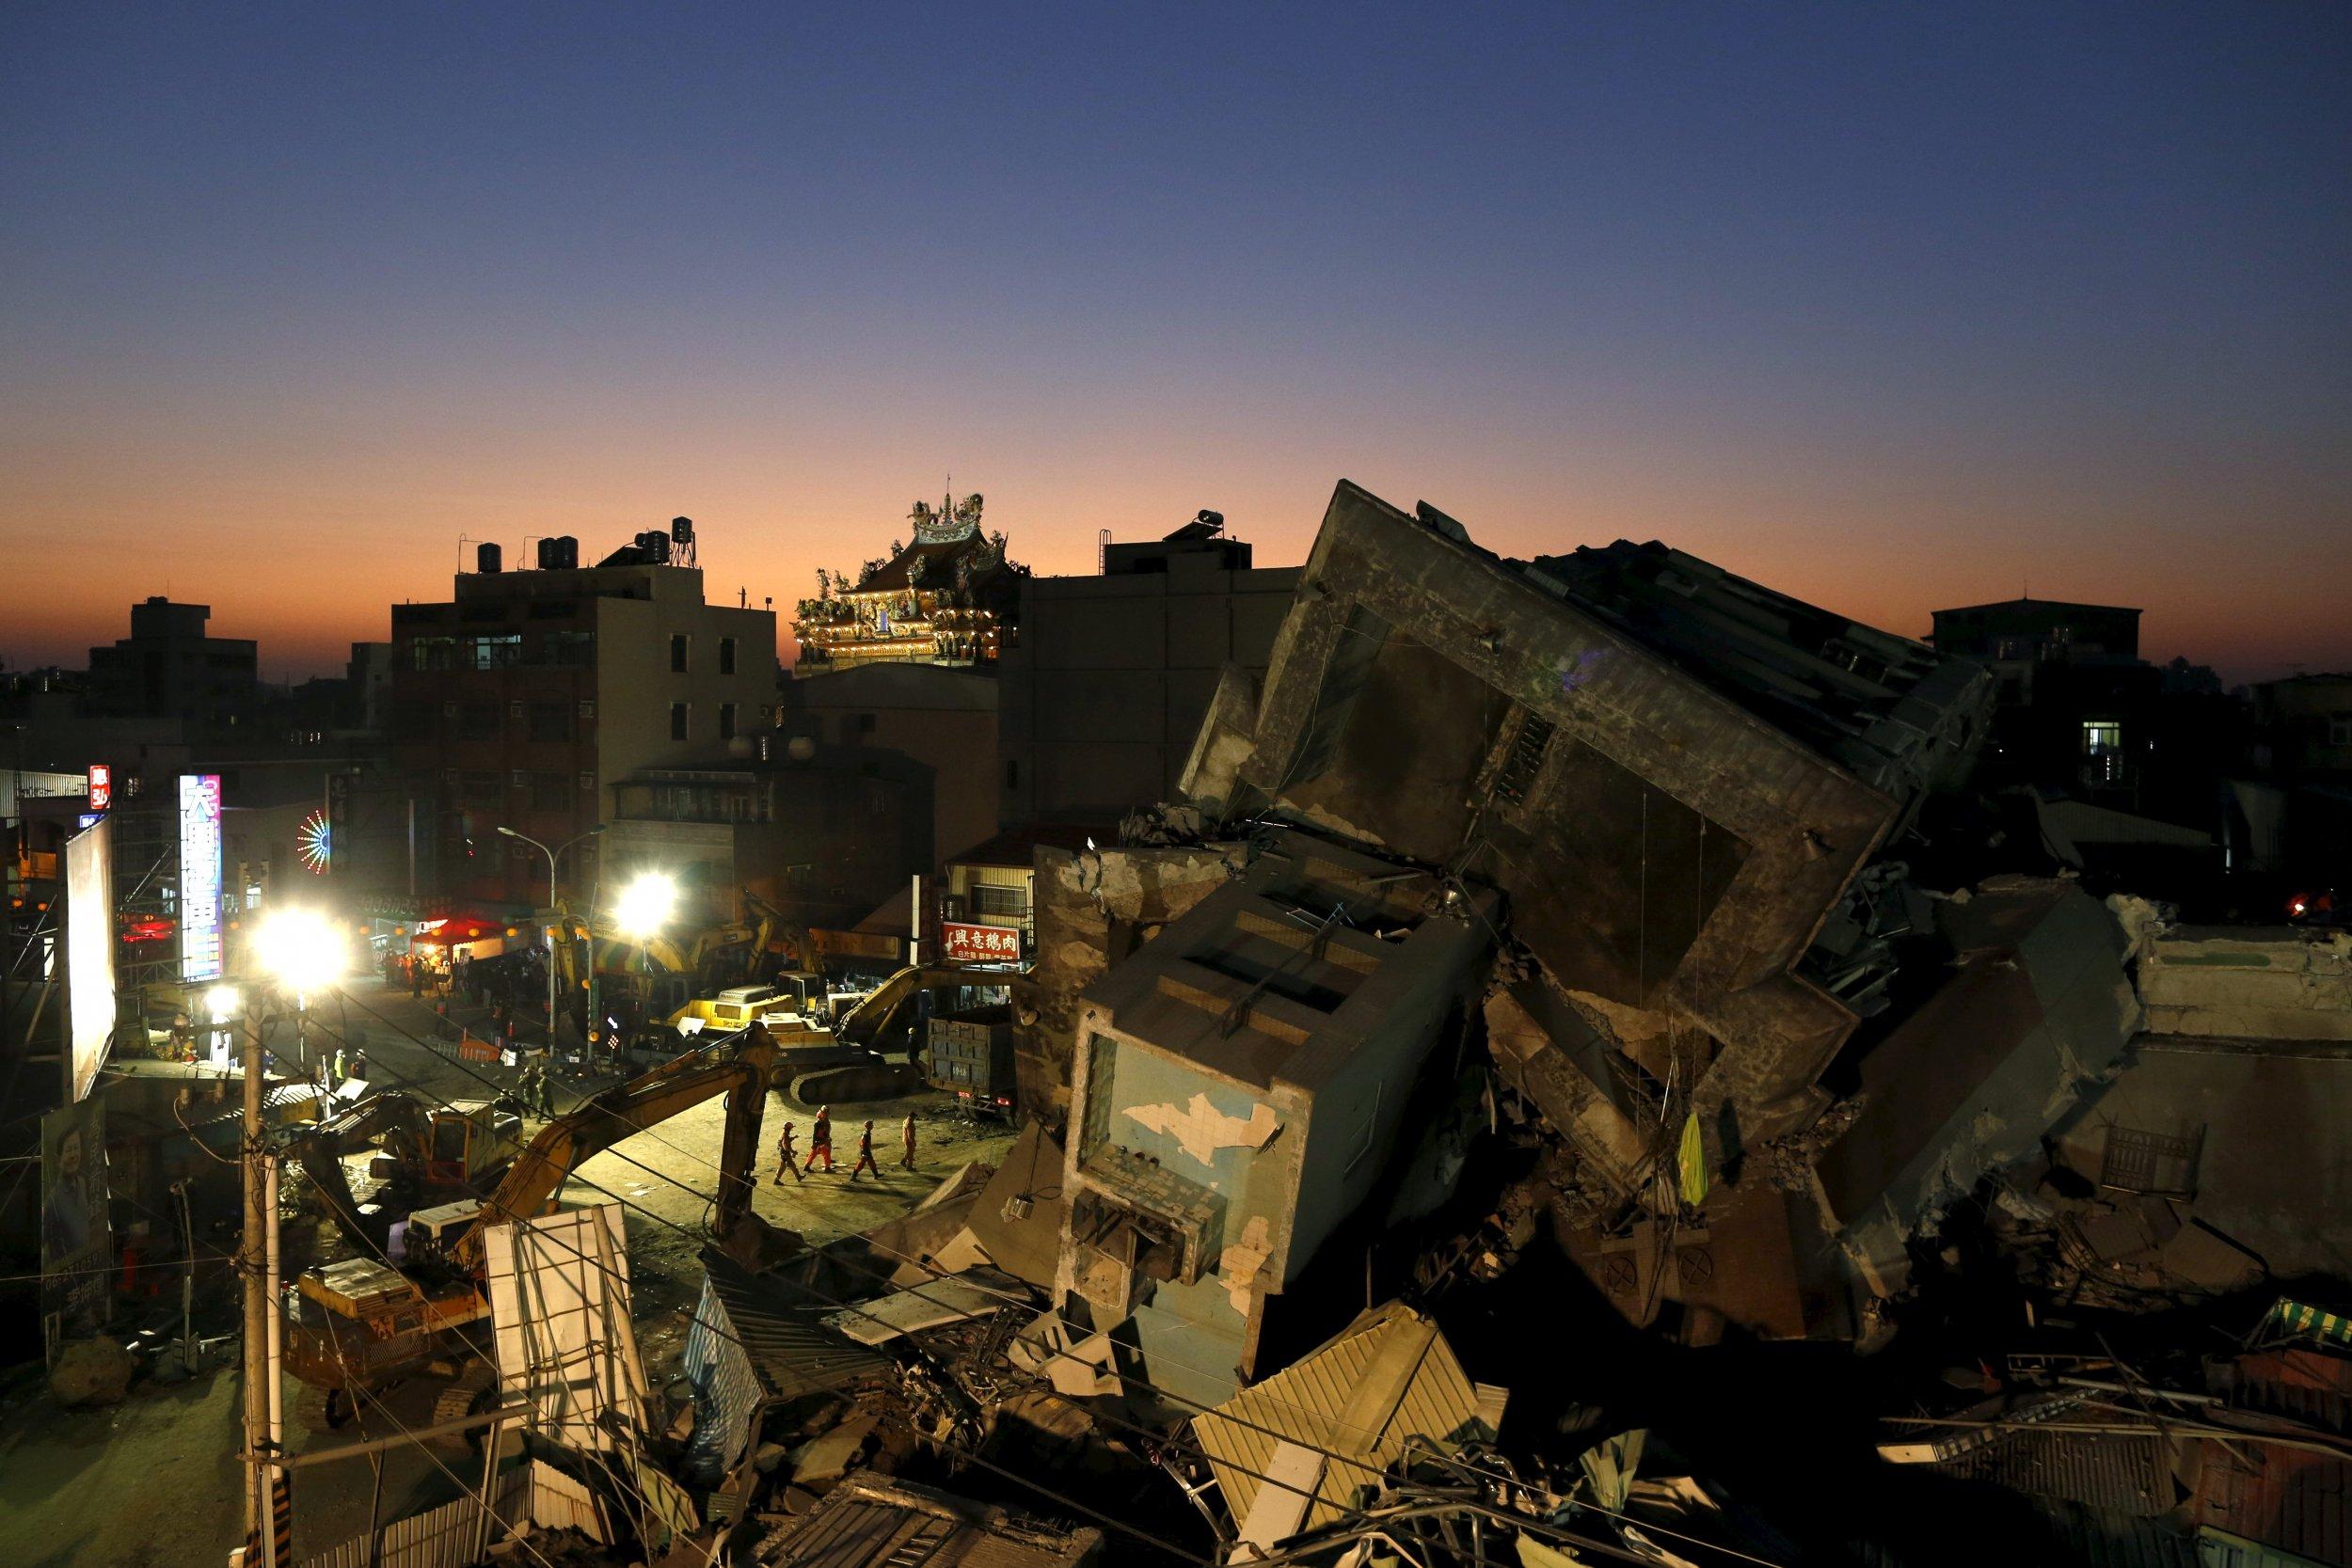 Earthquake Survivors and PTSD